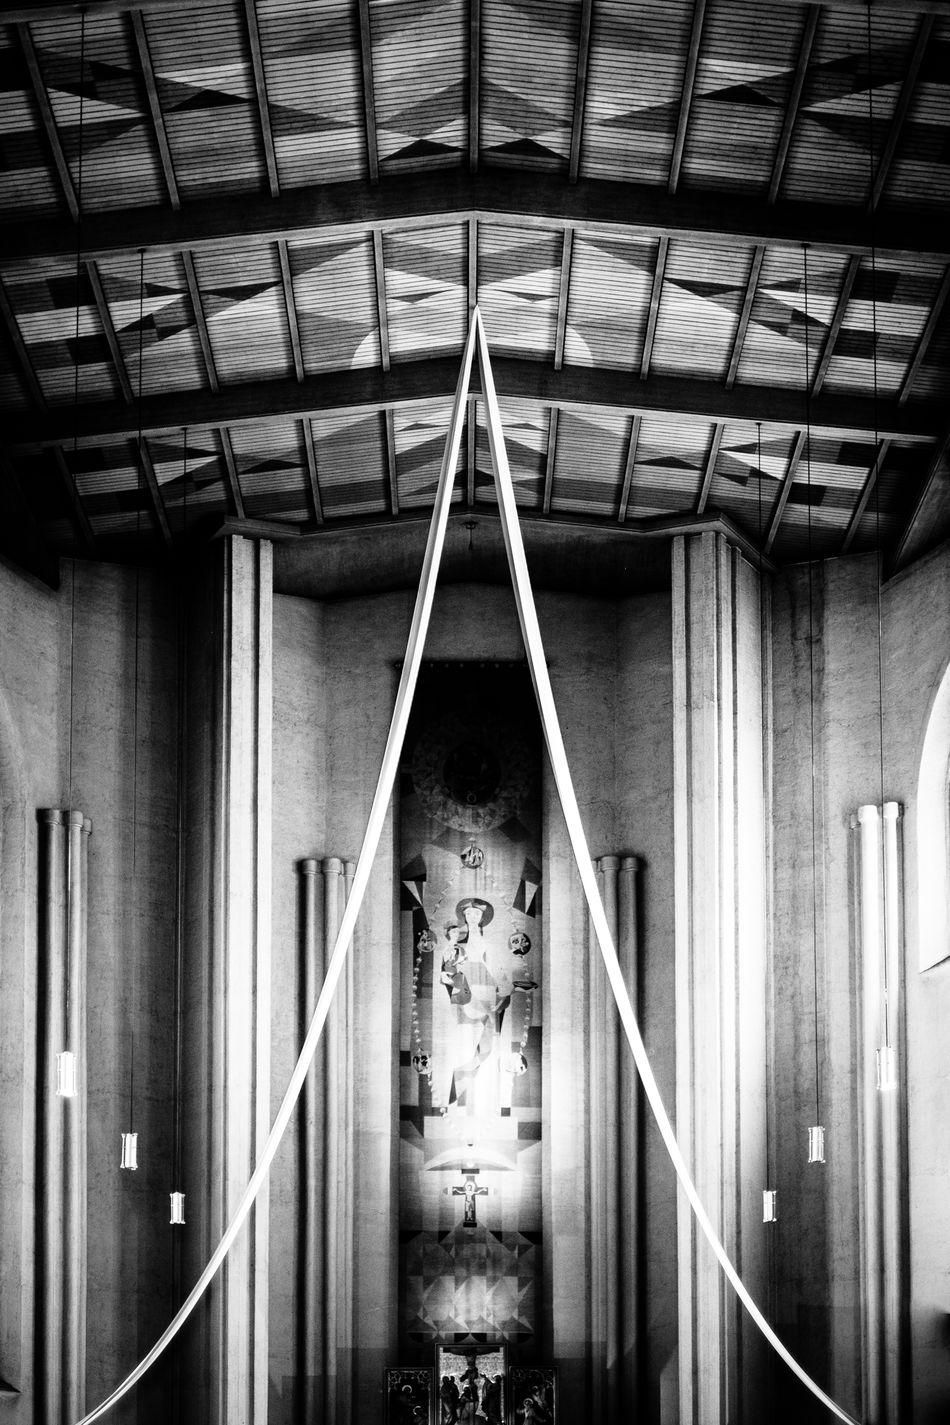 Architecture Blackandwhite Built Structure Church Church Architecture Churches Indoors  Mystical No People